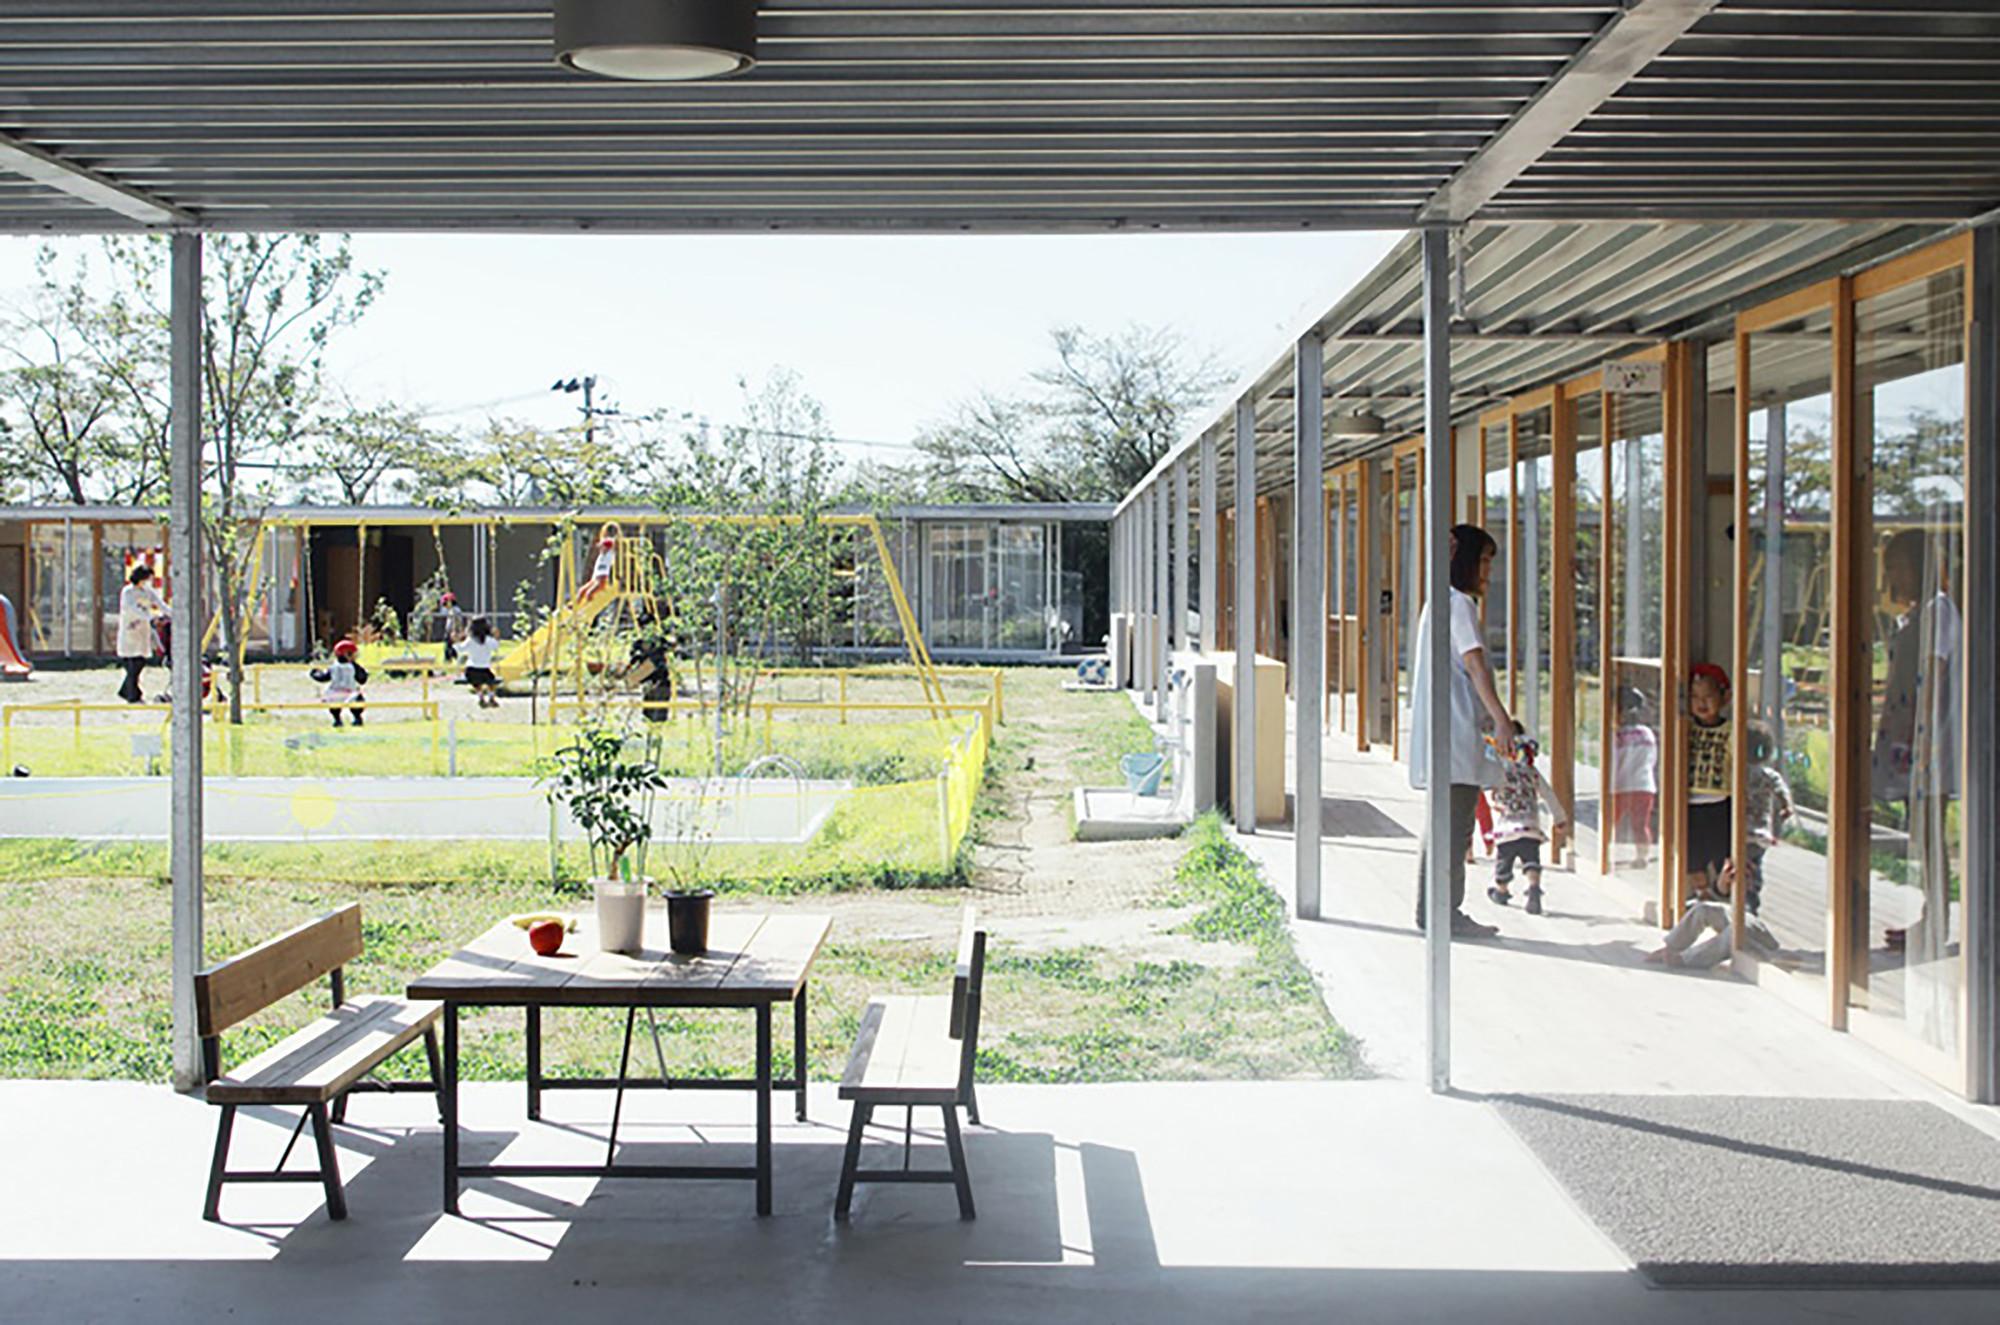 Shichigahama Tohyama Nursery / Takahashi Ippei Office, © Iwan Baan